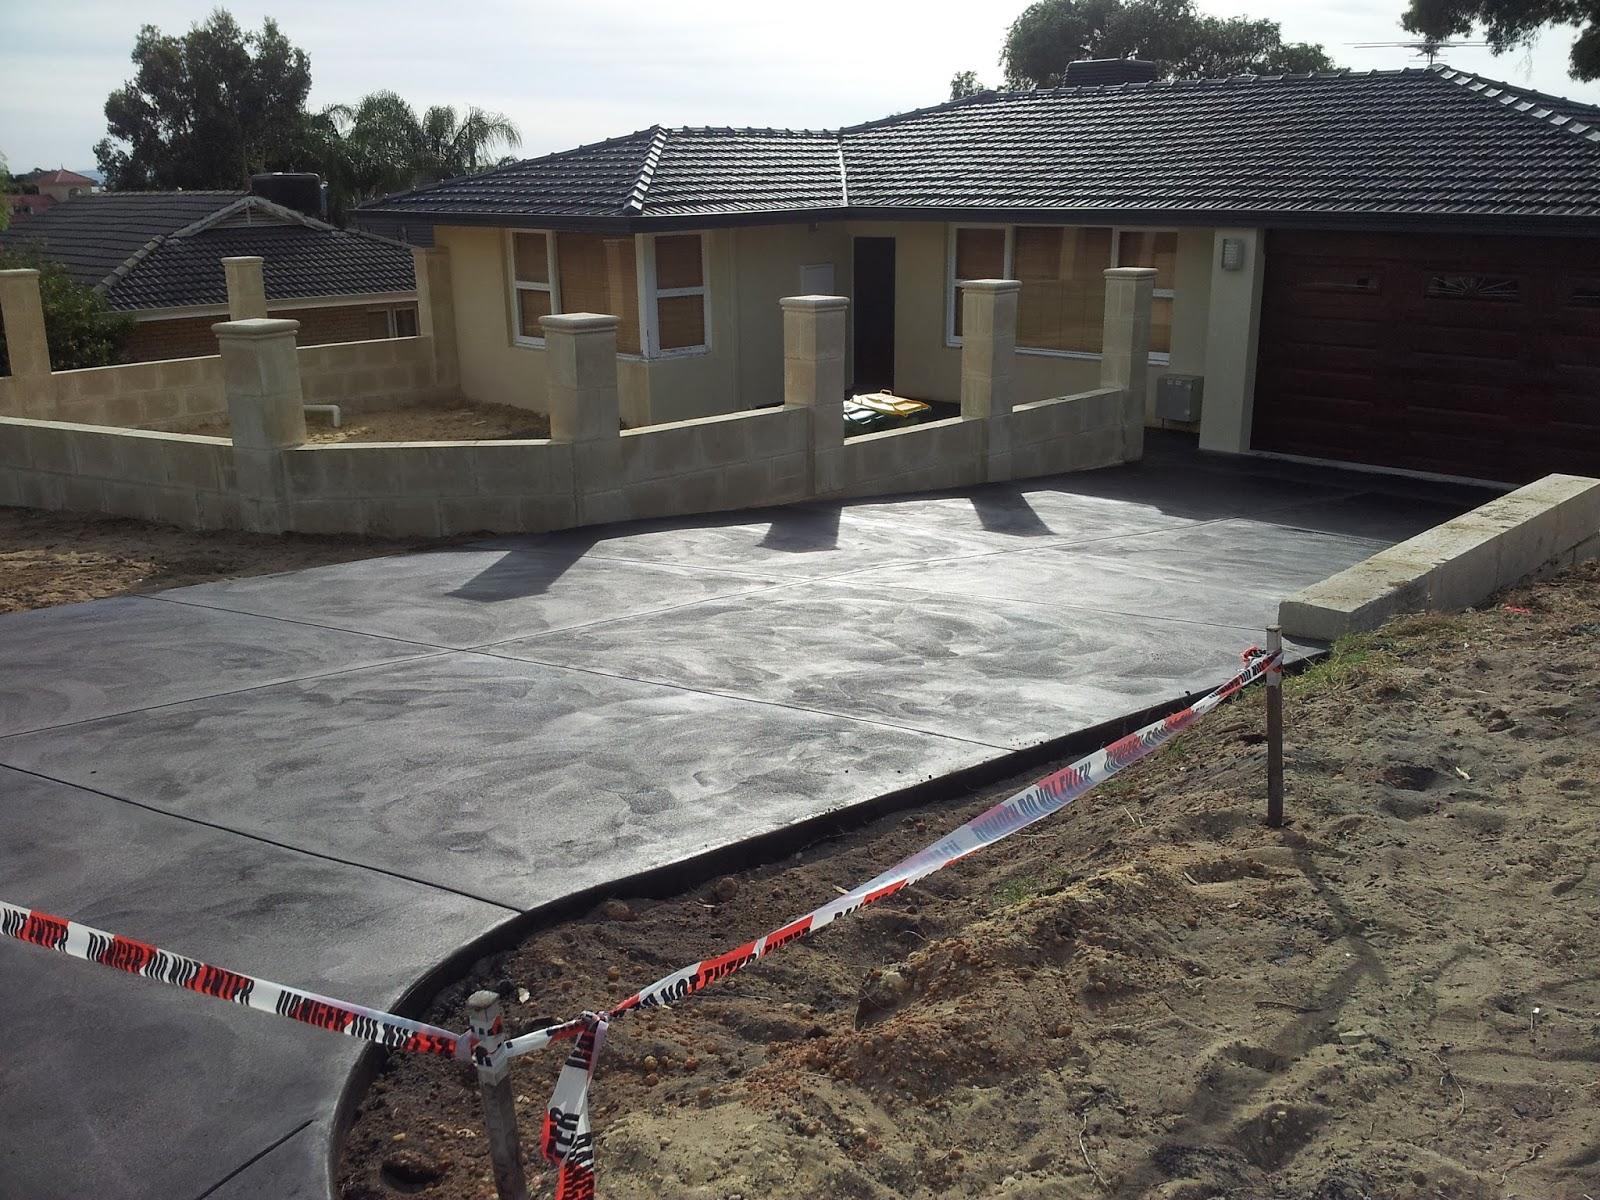 http://jarrahjungle.blogspot.com.au/2013/11/say-hello-to-my-new-shiny-flat-driveway.html